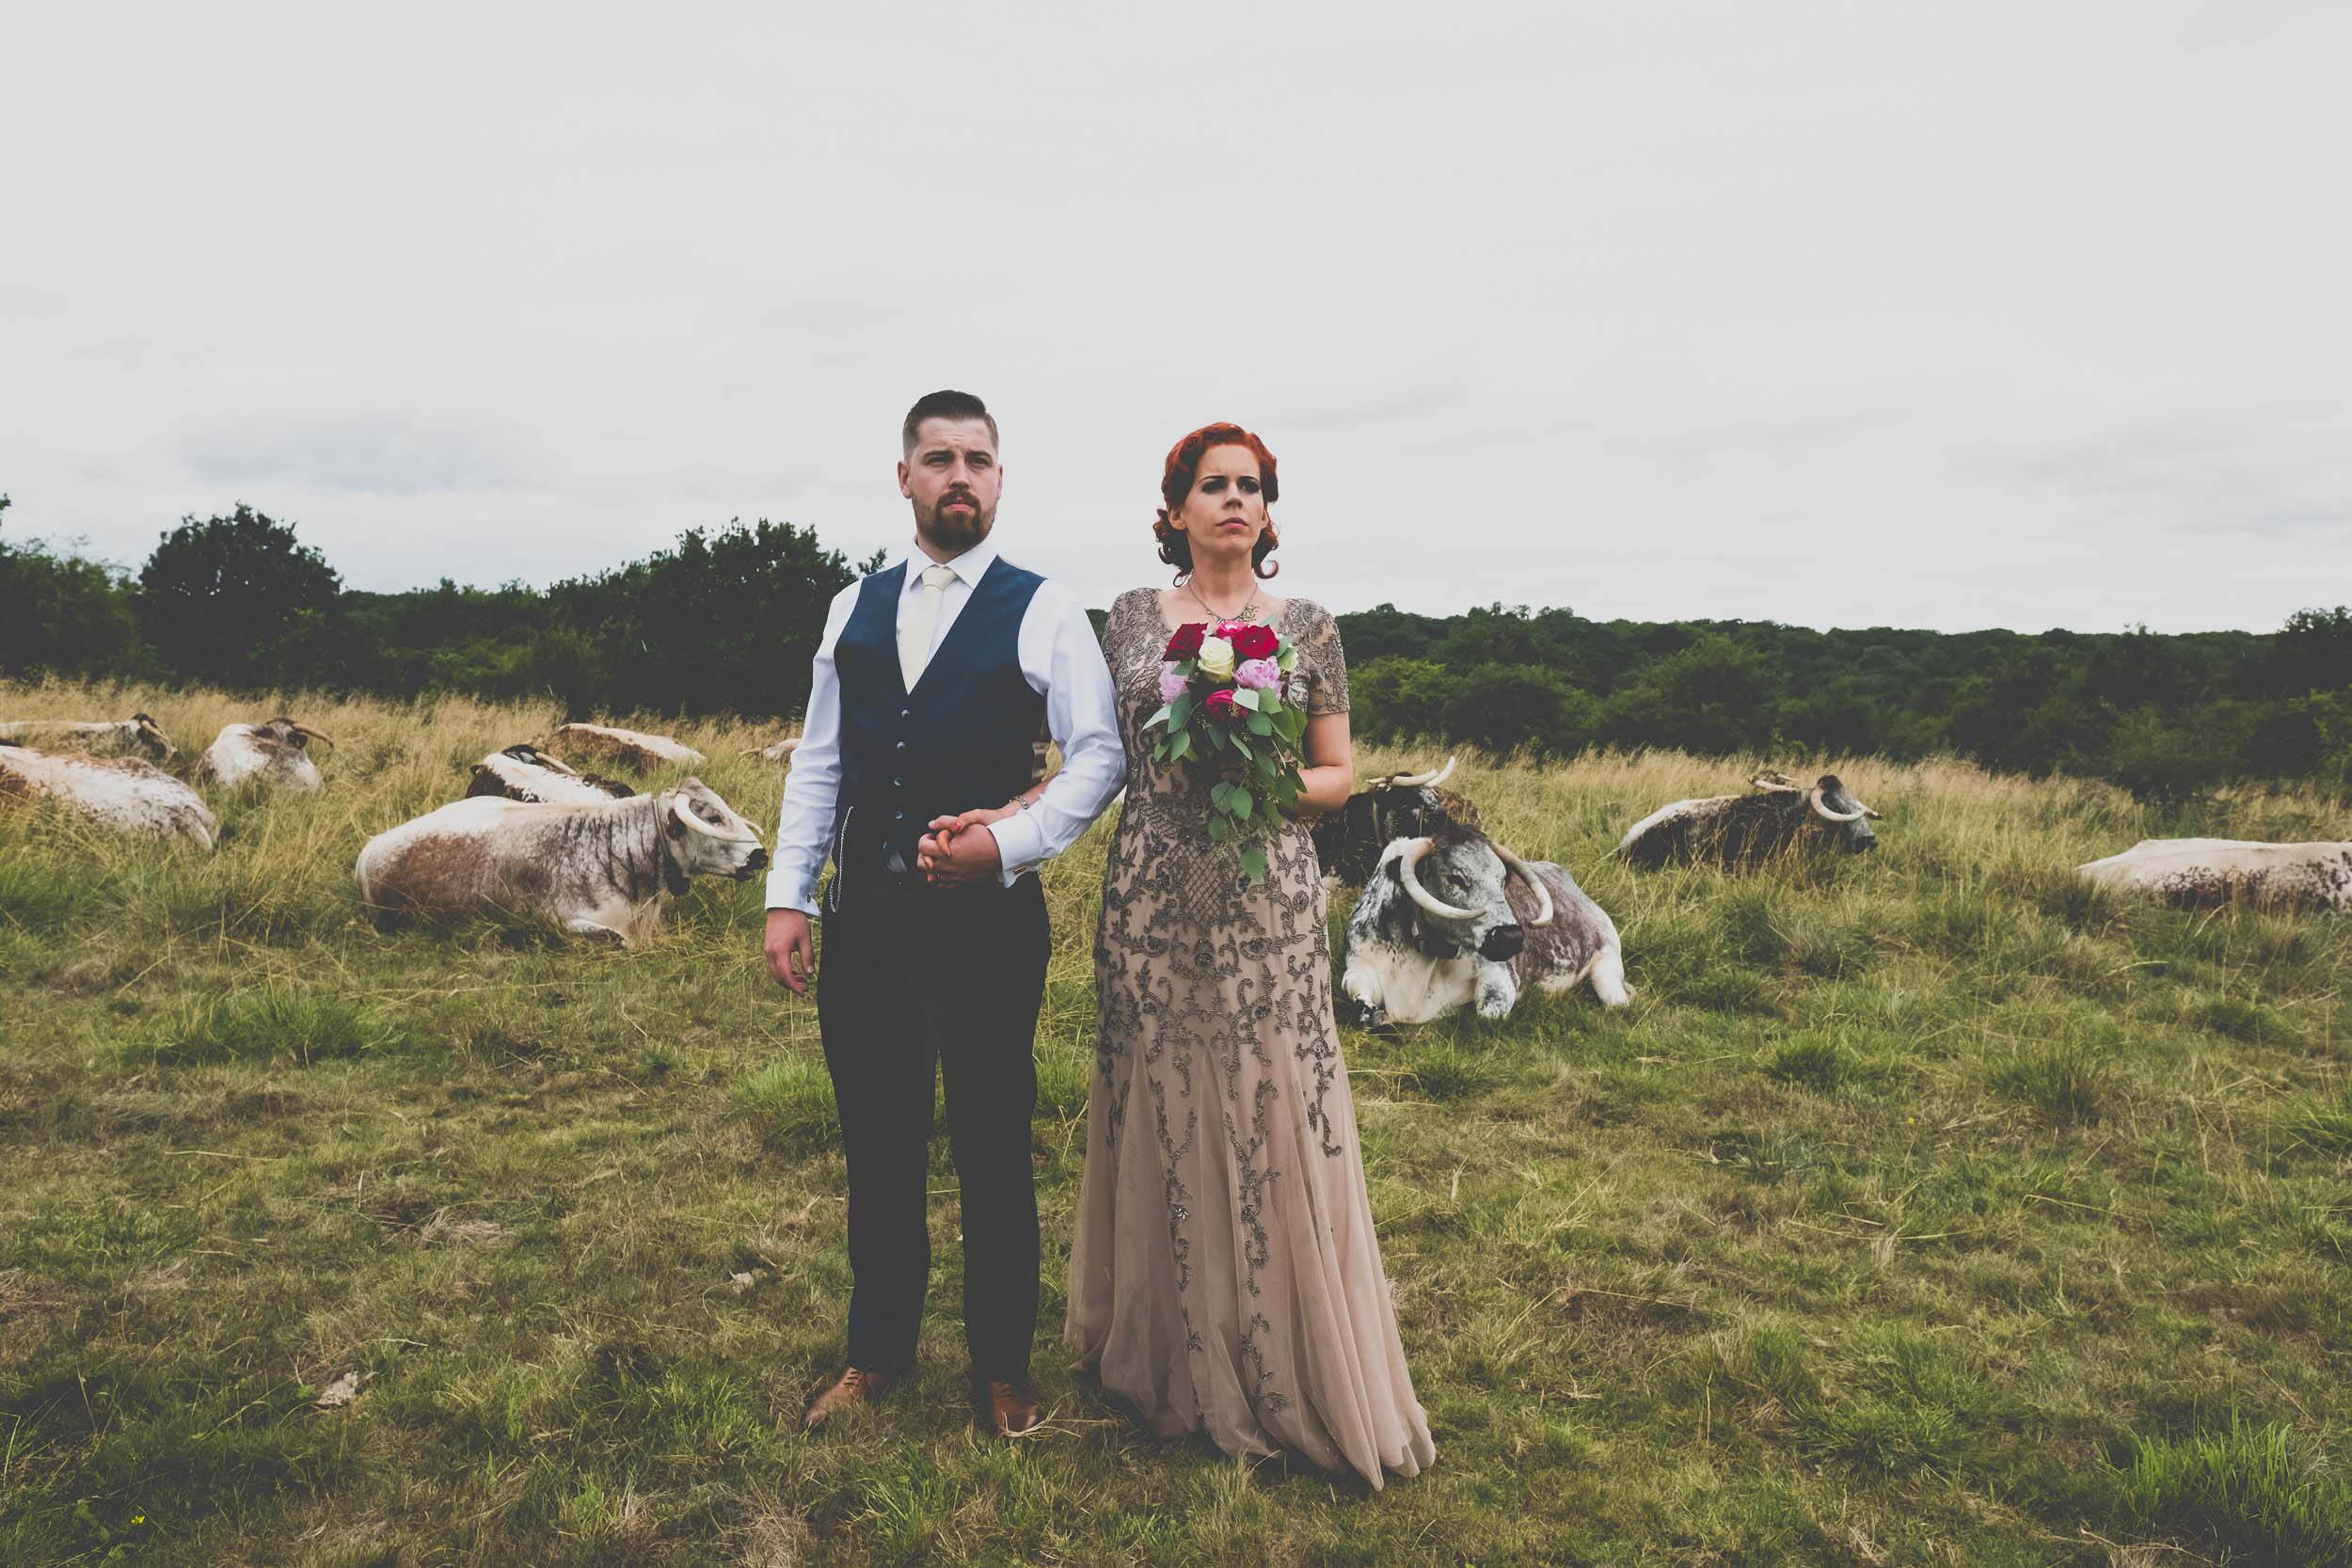 queen-elizabeths-hunting-lodge-epping-forest-wedding246.jpg